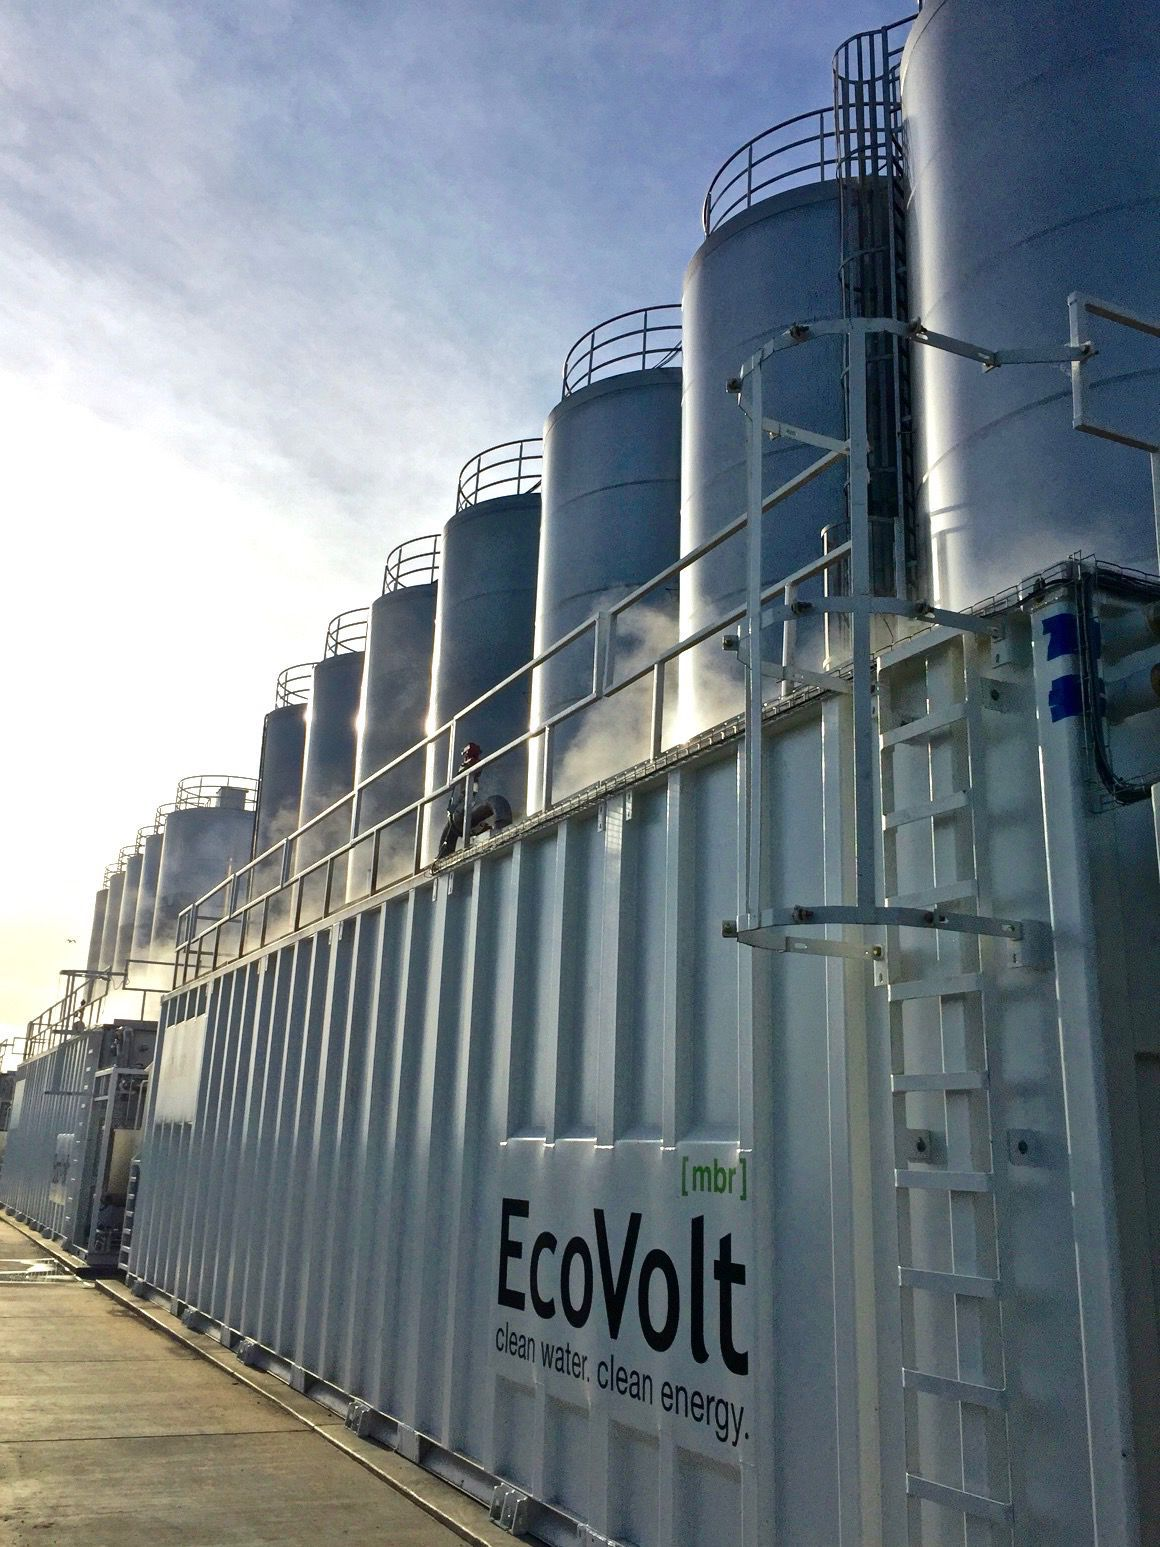 Cambrian's EcoVolt